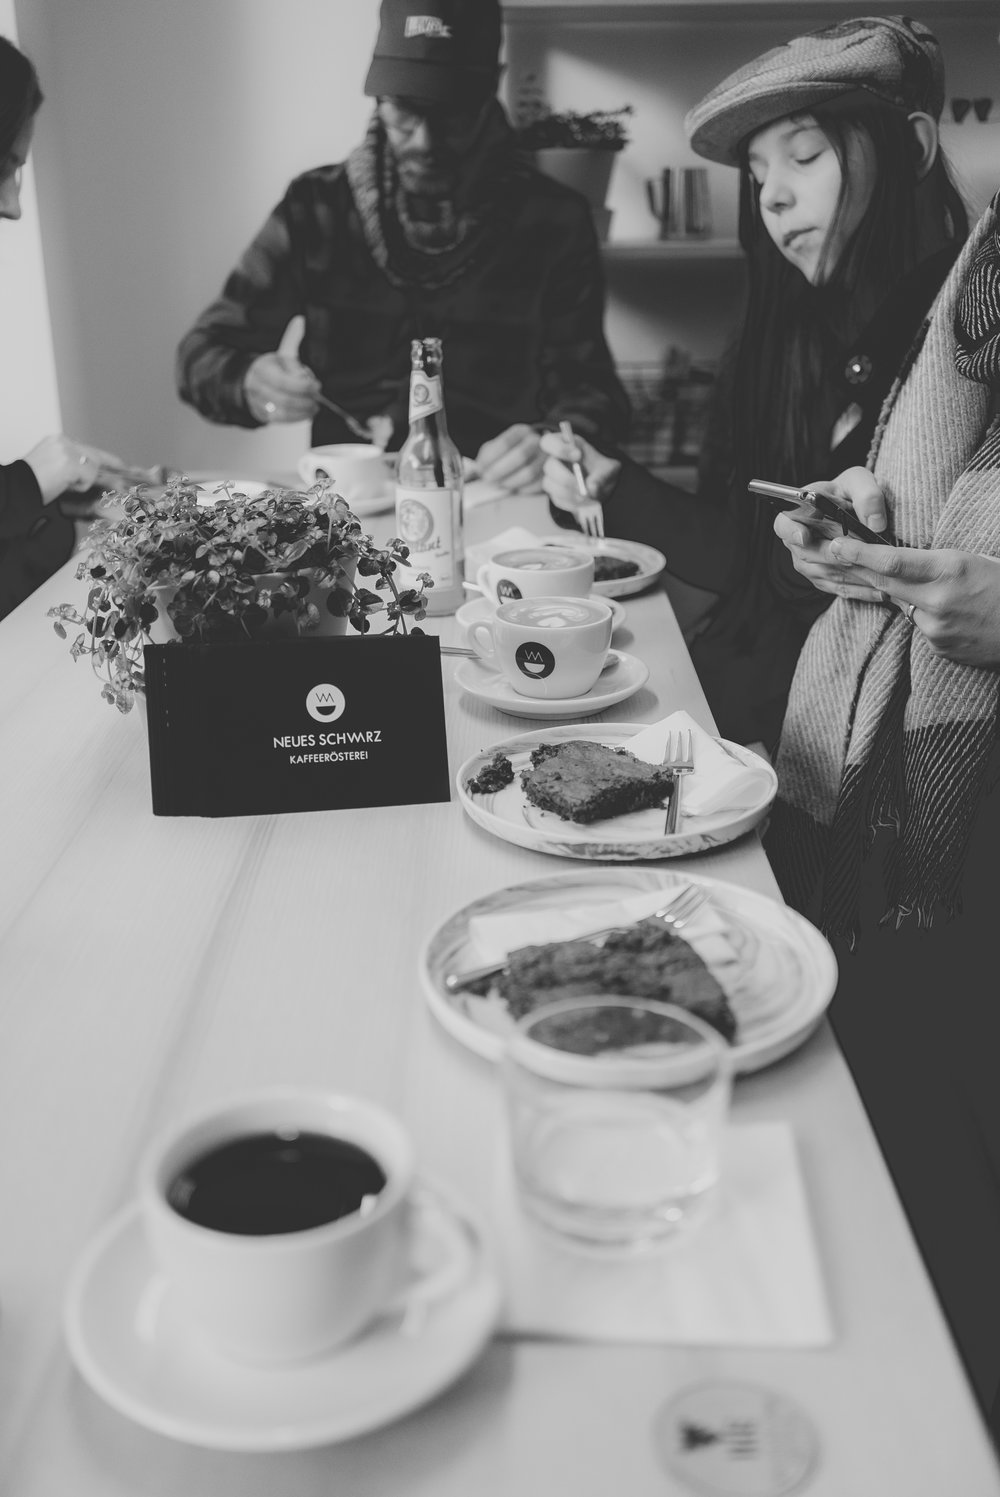 neues-schwarz-kaffeebar-32.jpg